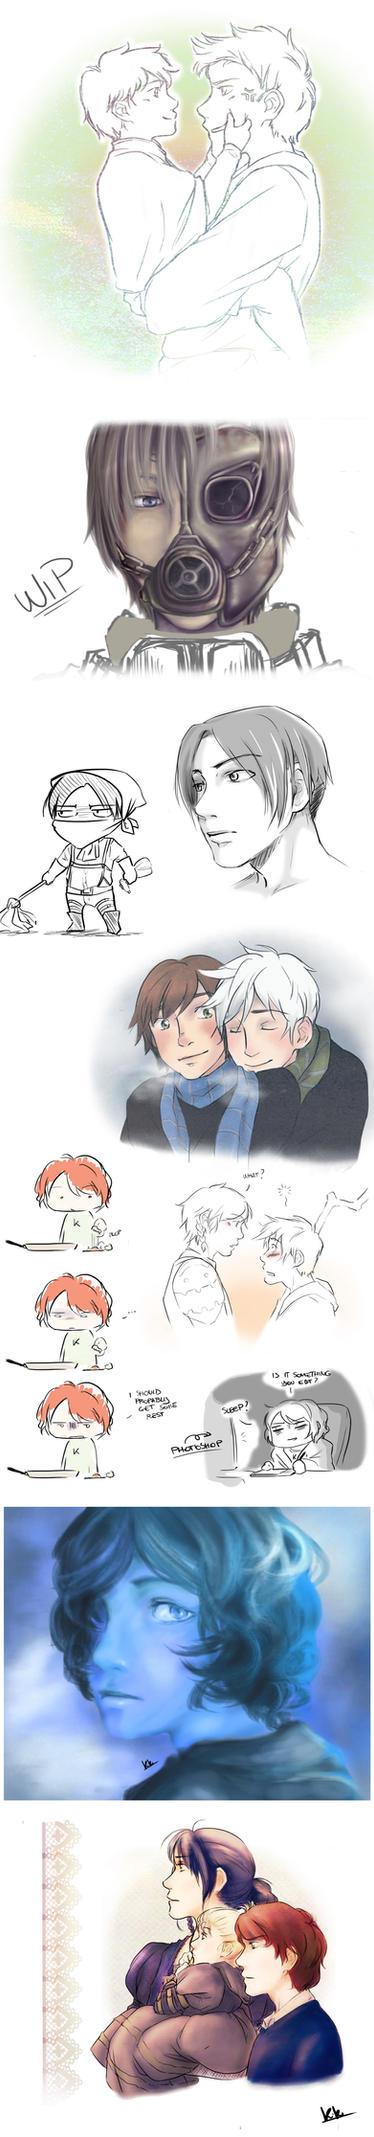 Random sketches. by KikiKinchester